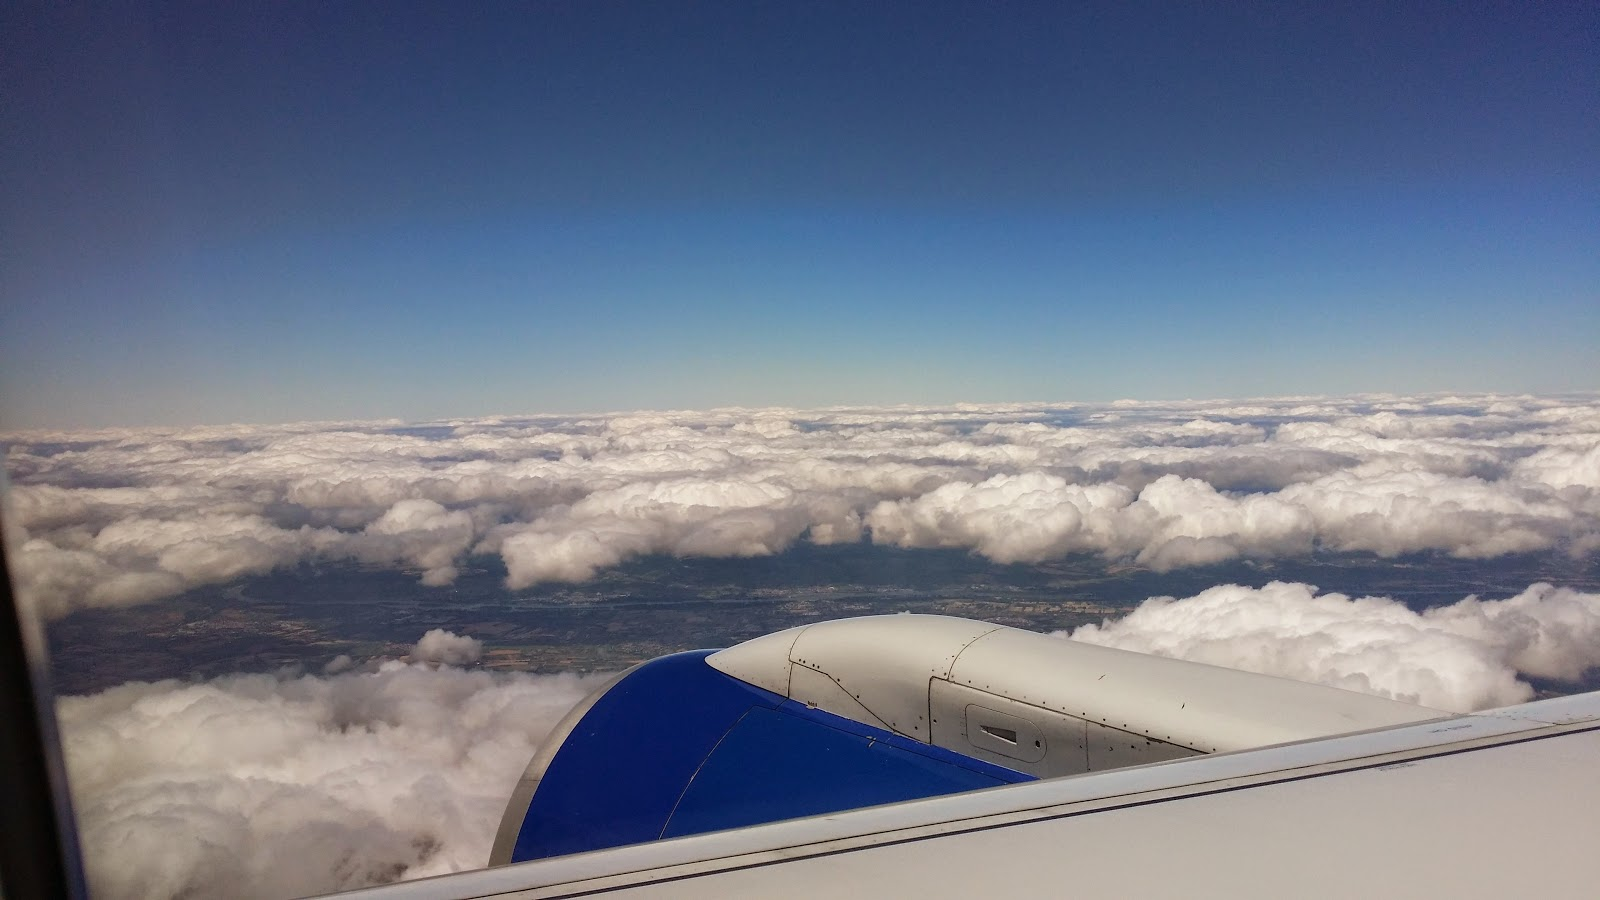 Gran Canaria Reise Info Mit Condor Nach Gran Canaria